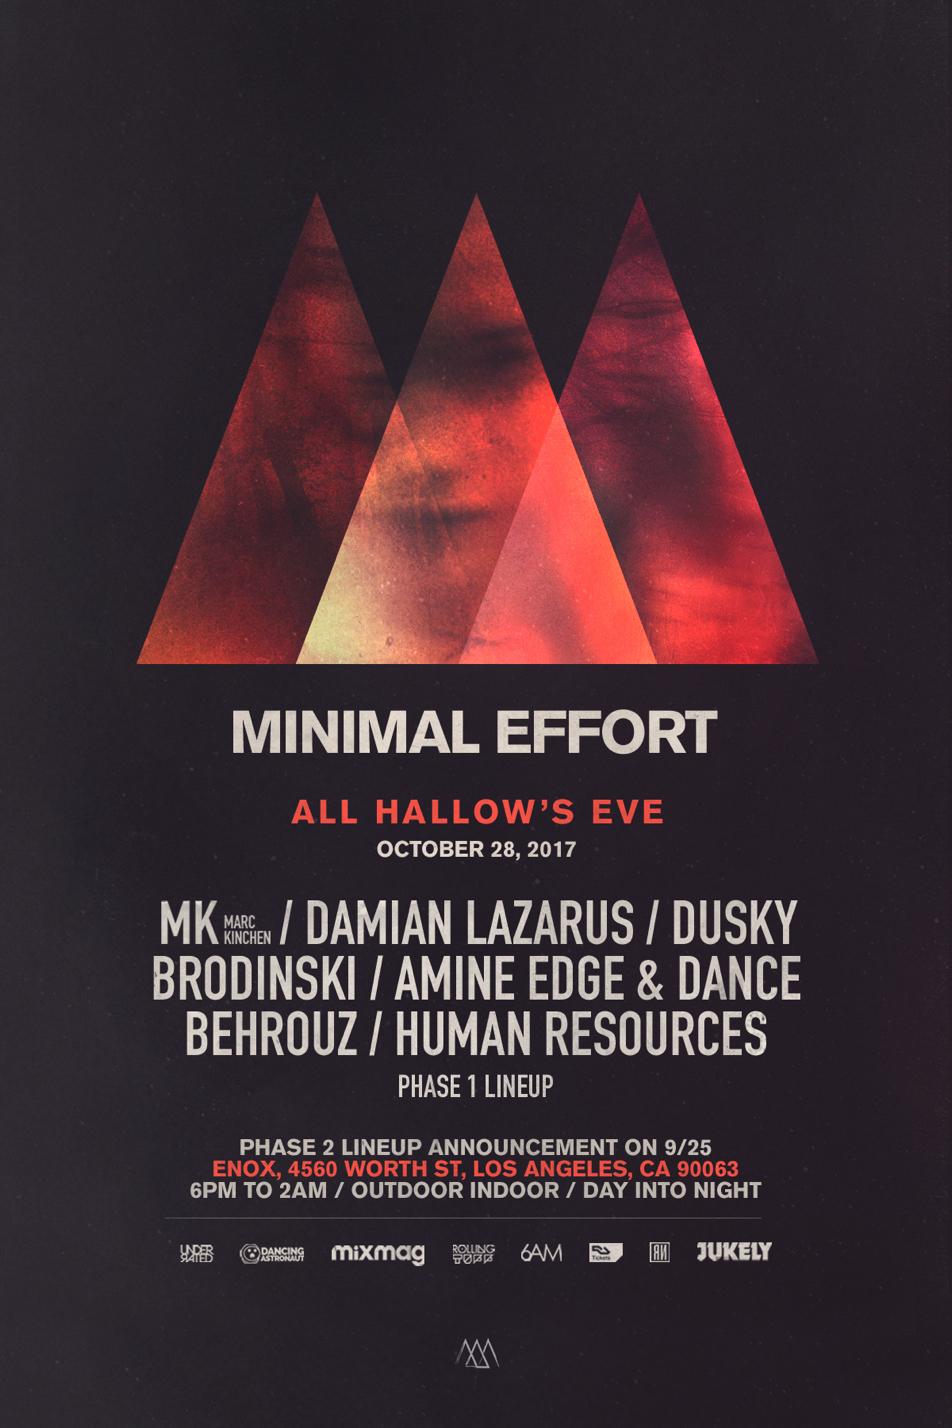 Minimal Effort announces LA Halloween party lineup image